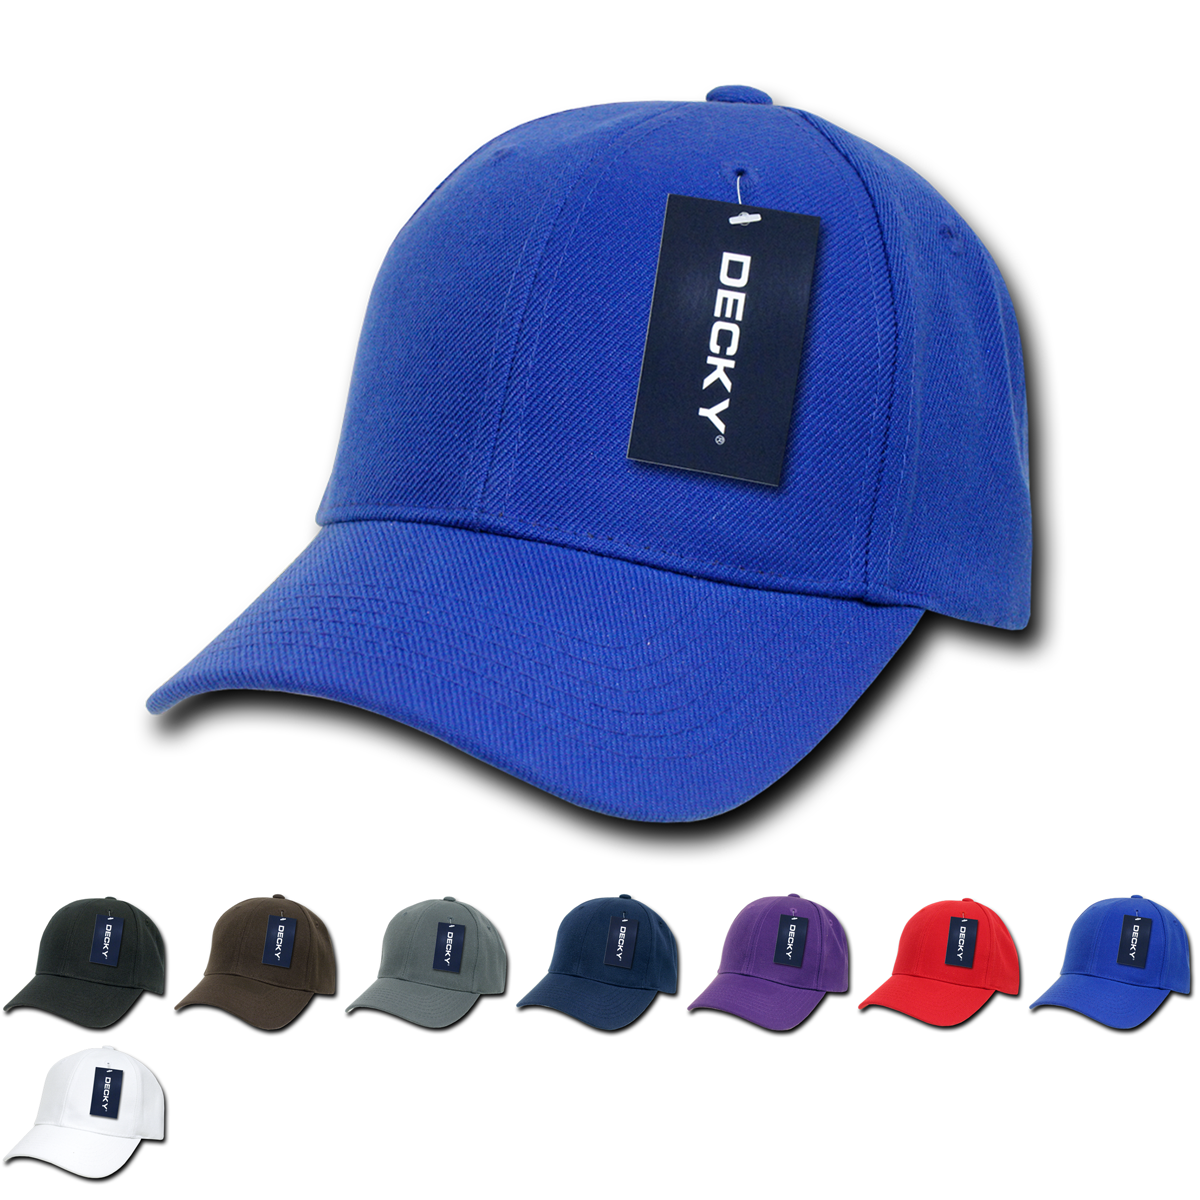 DECKY 6 Panel Curve Bill Baseball Trucker Constructed Caps Cap Hats Unisex